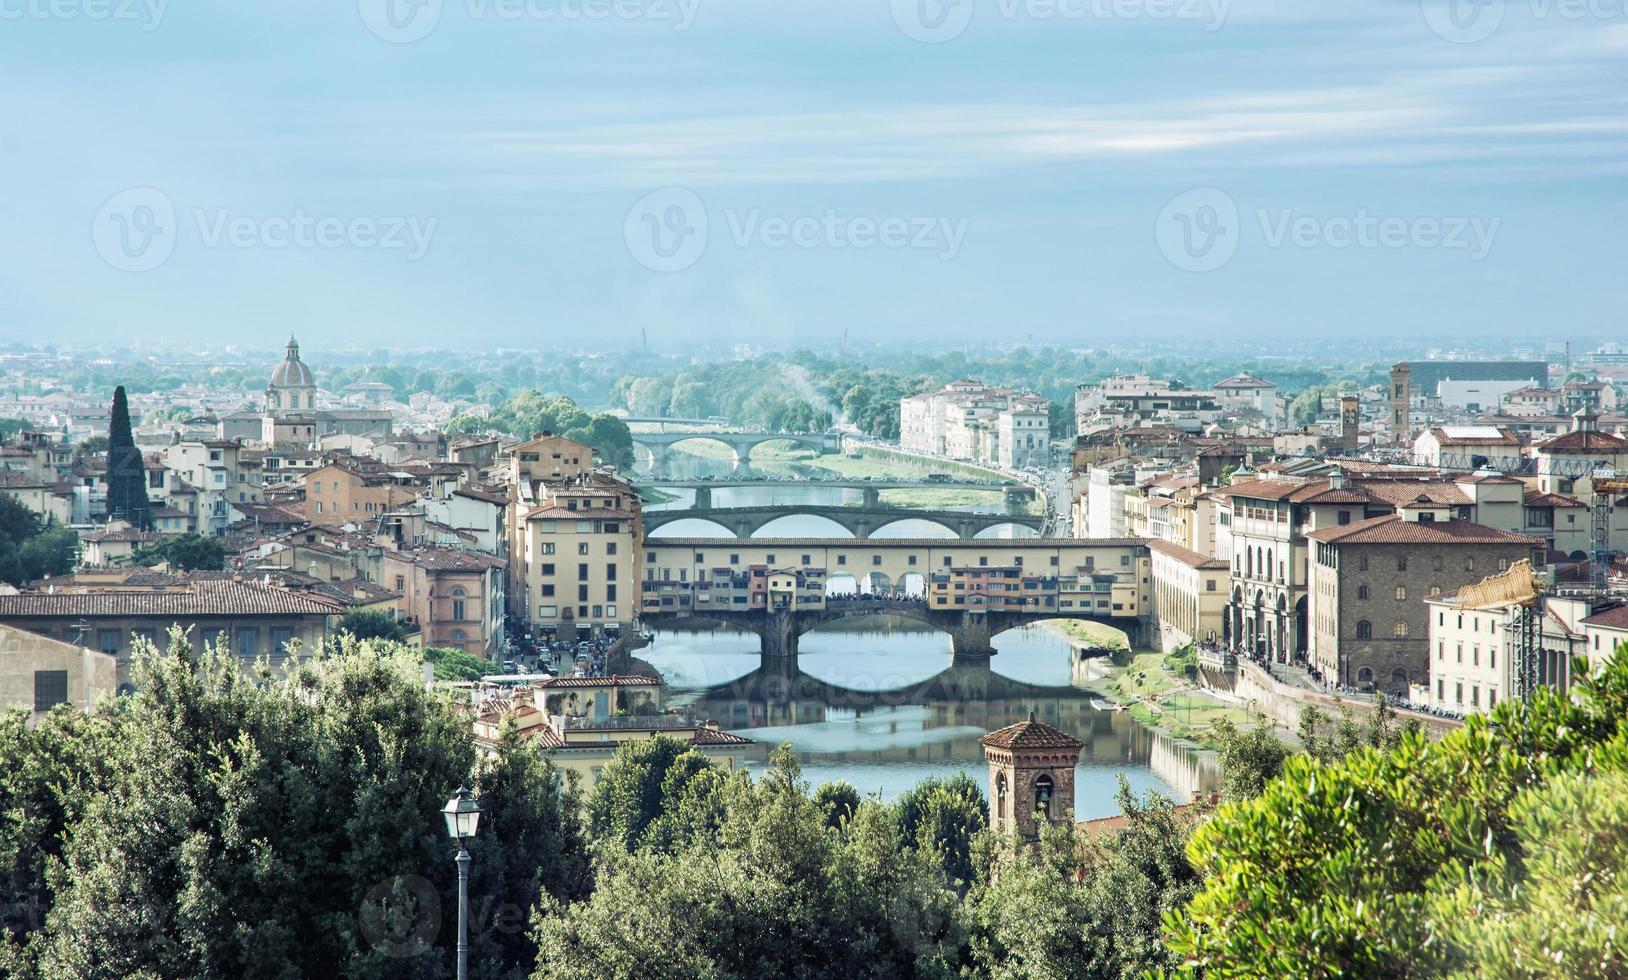 Florens stad med fantastisk bro Ponte Vecchio, Italien, resor d foto